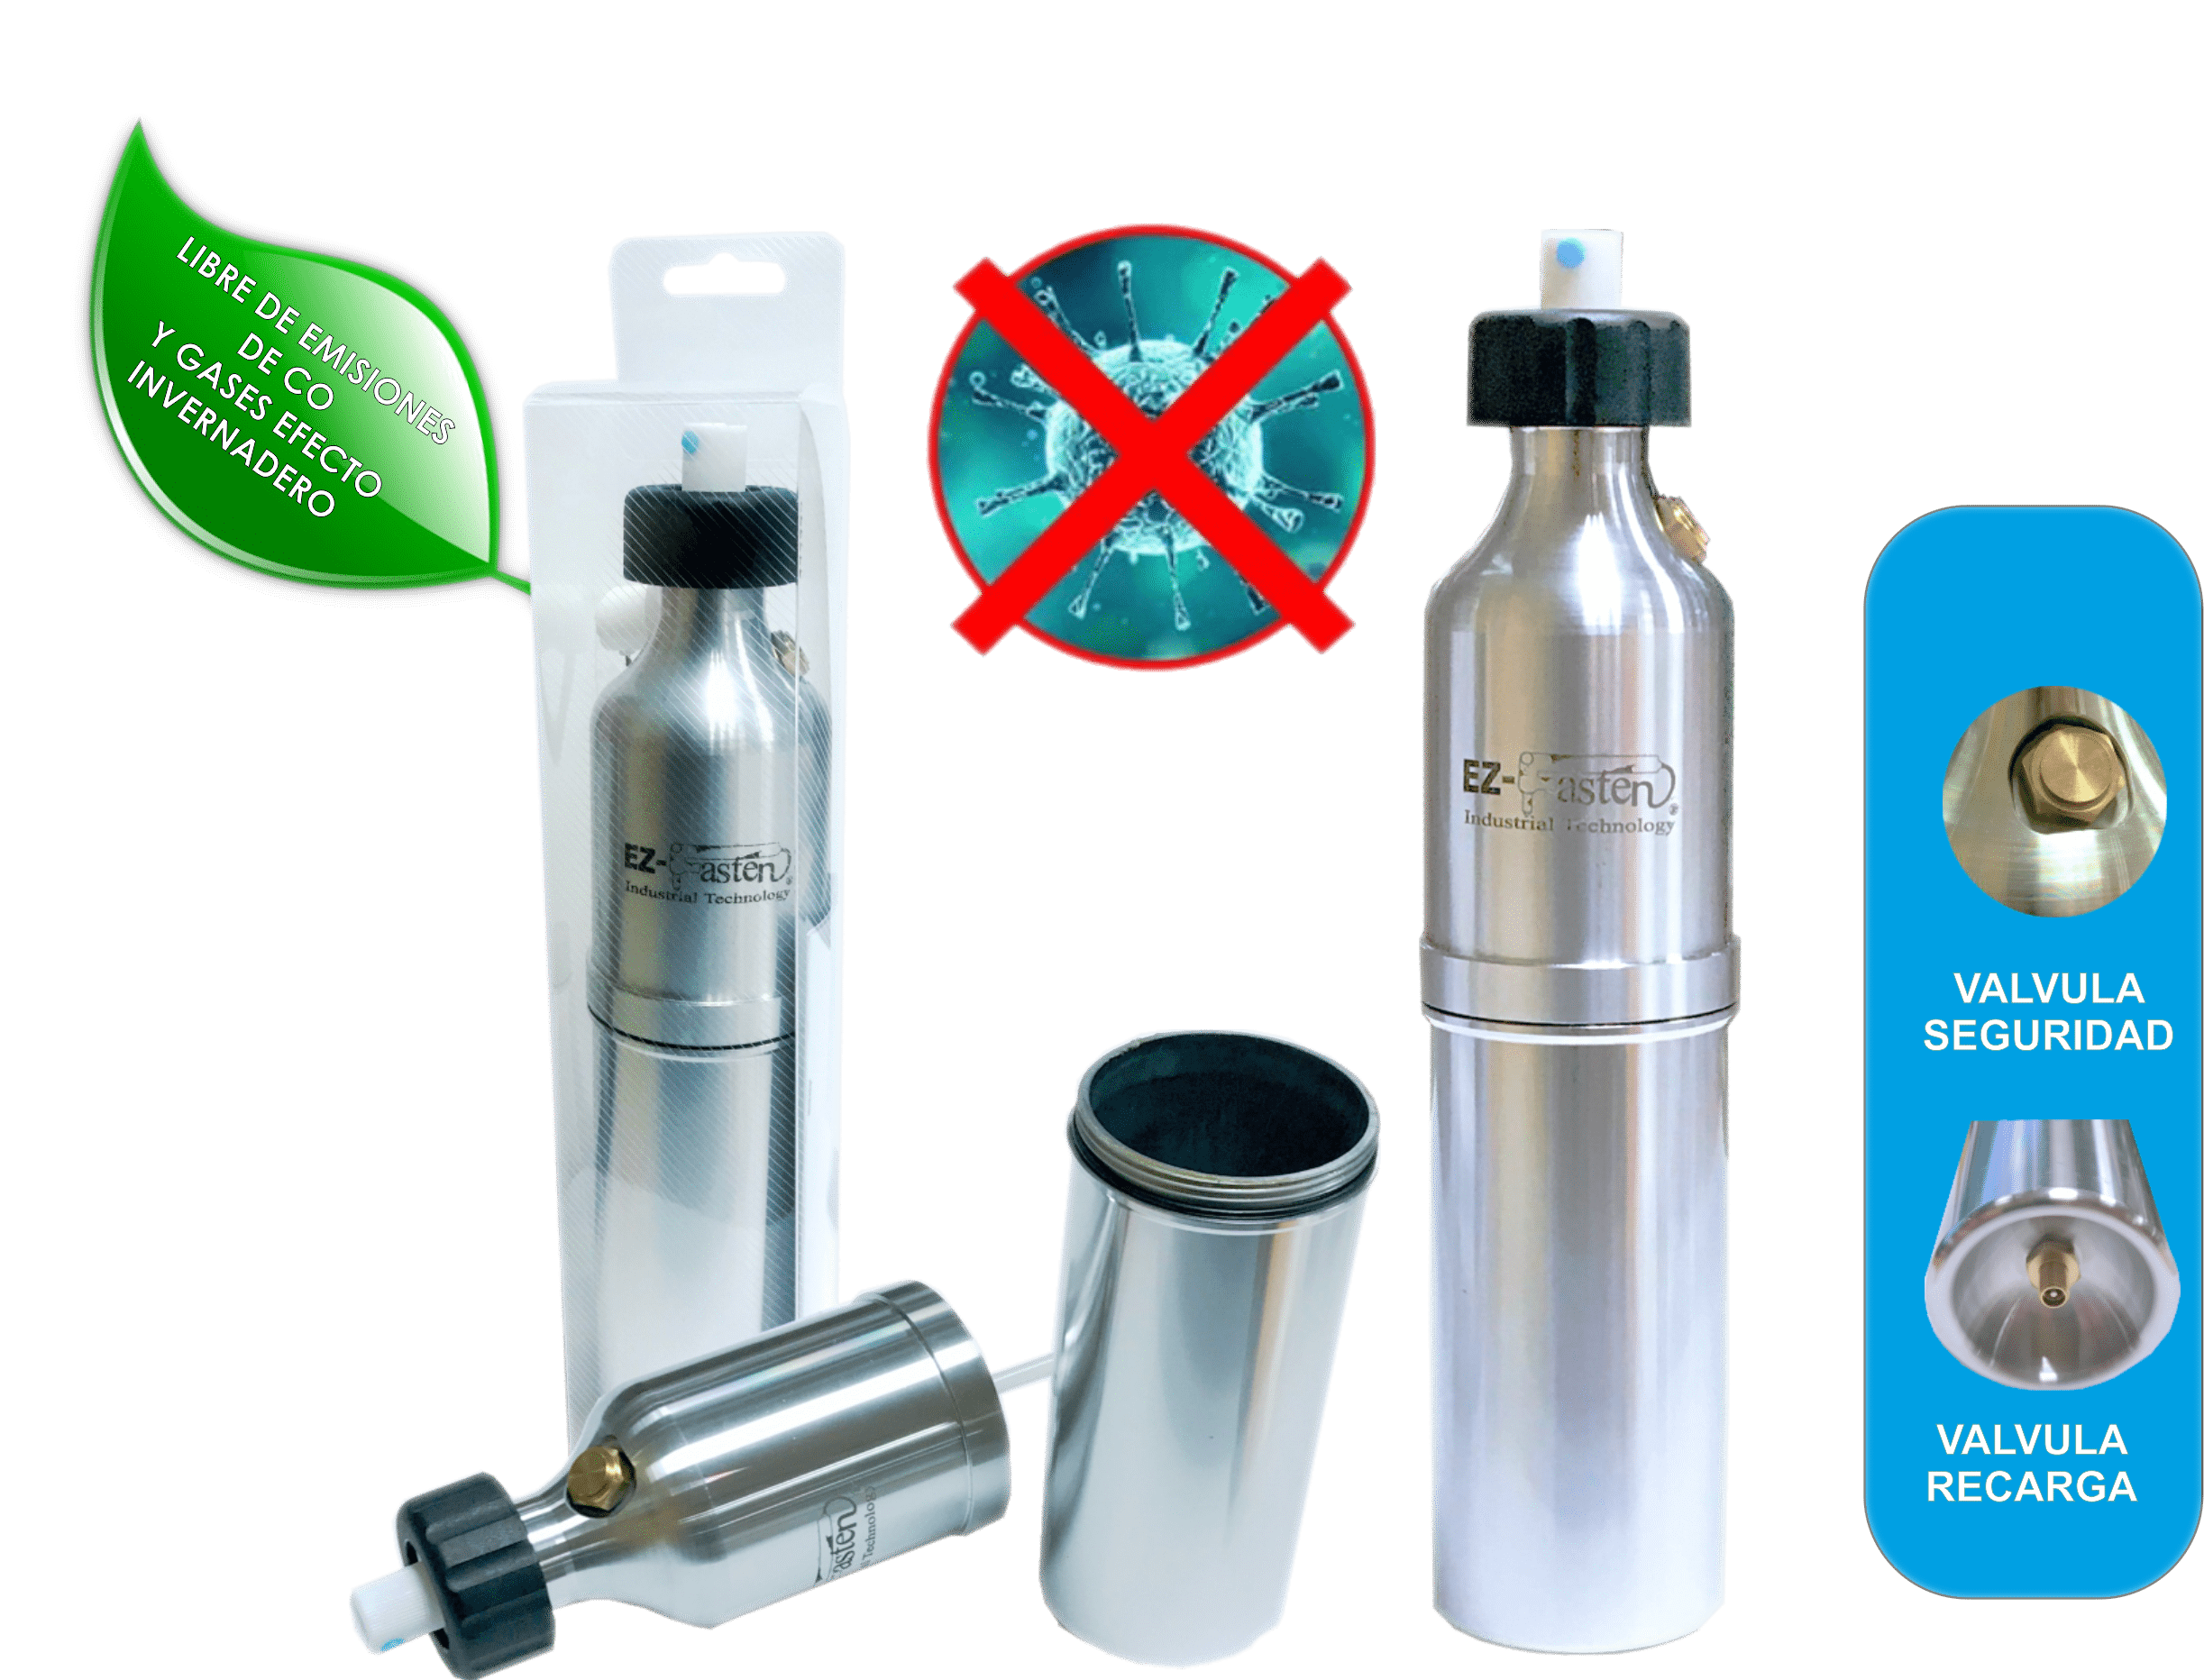 Spray EZ-Fasten Covid